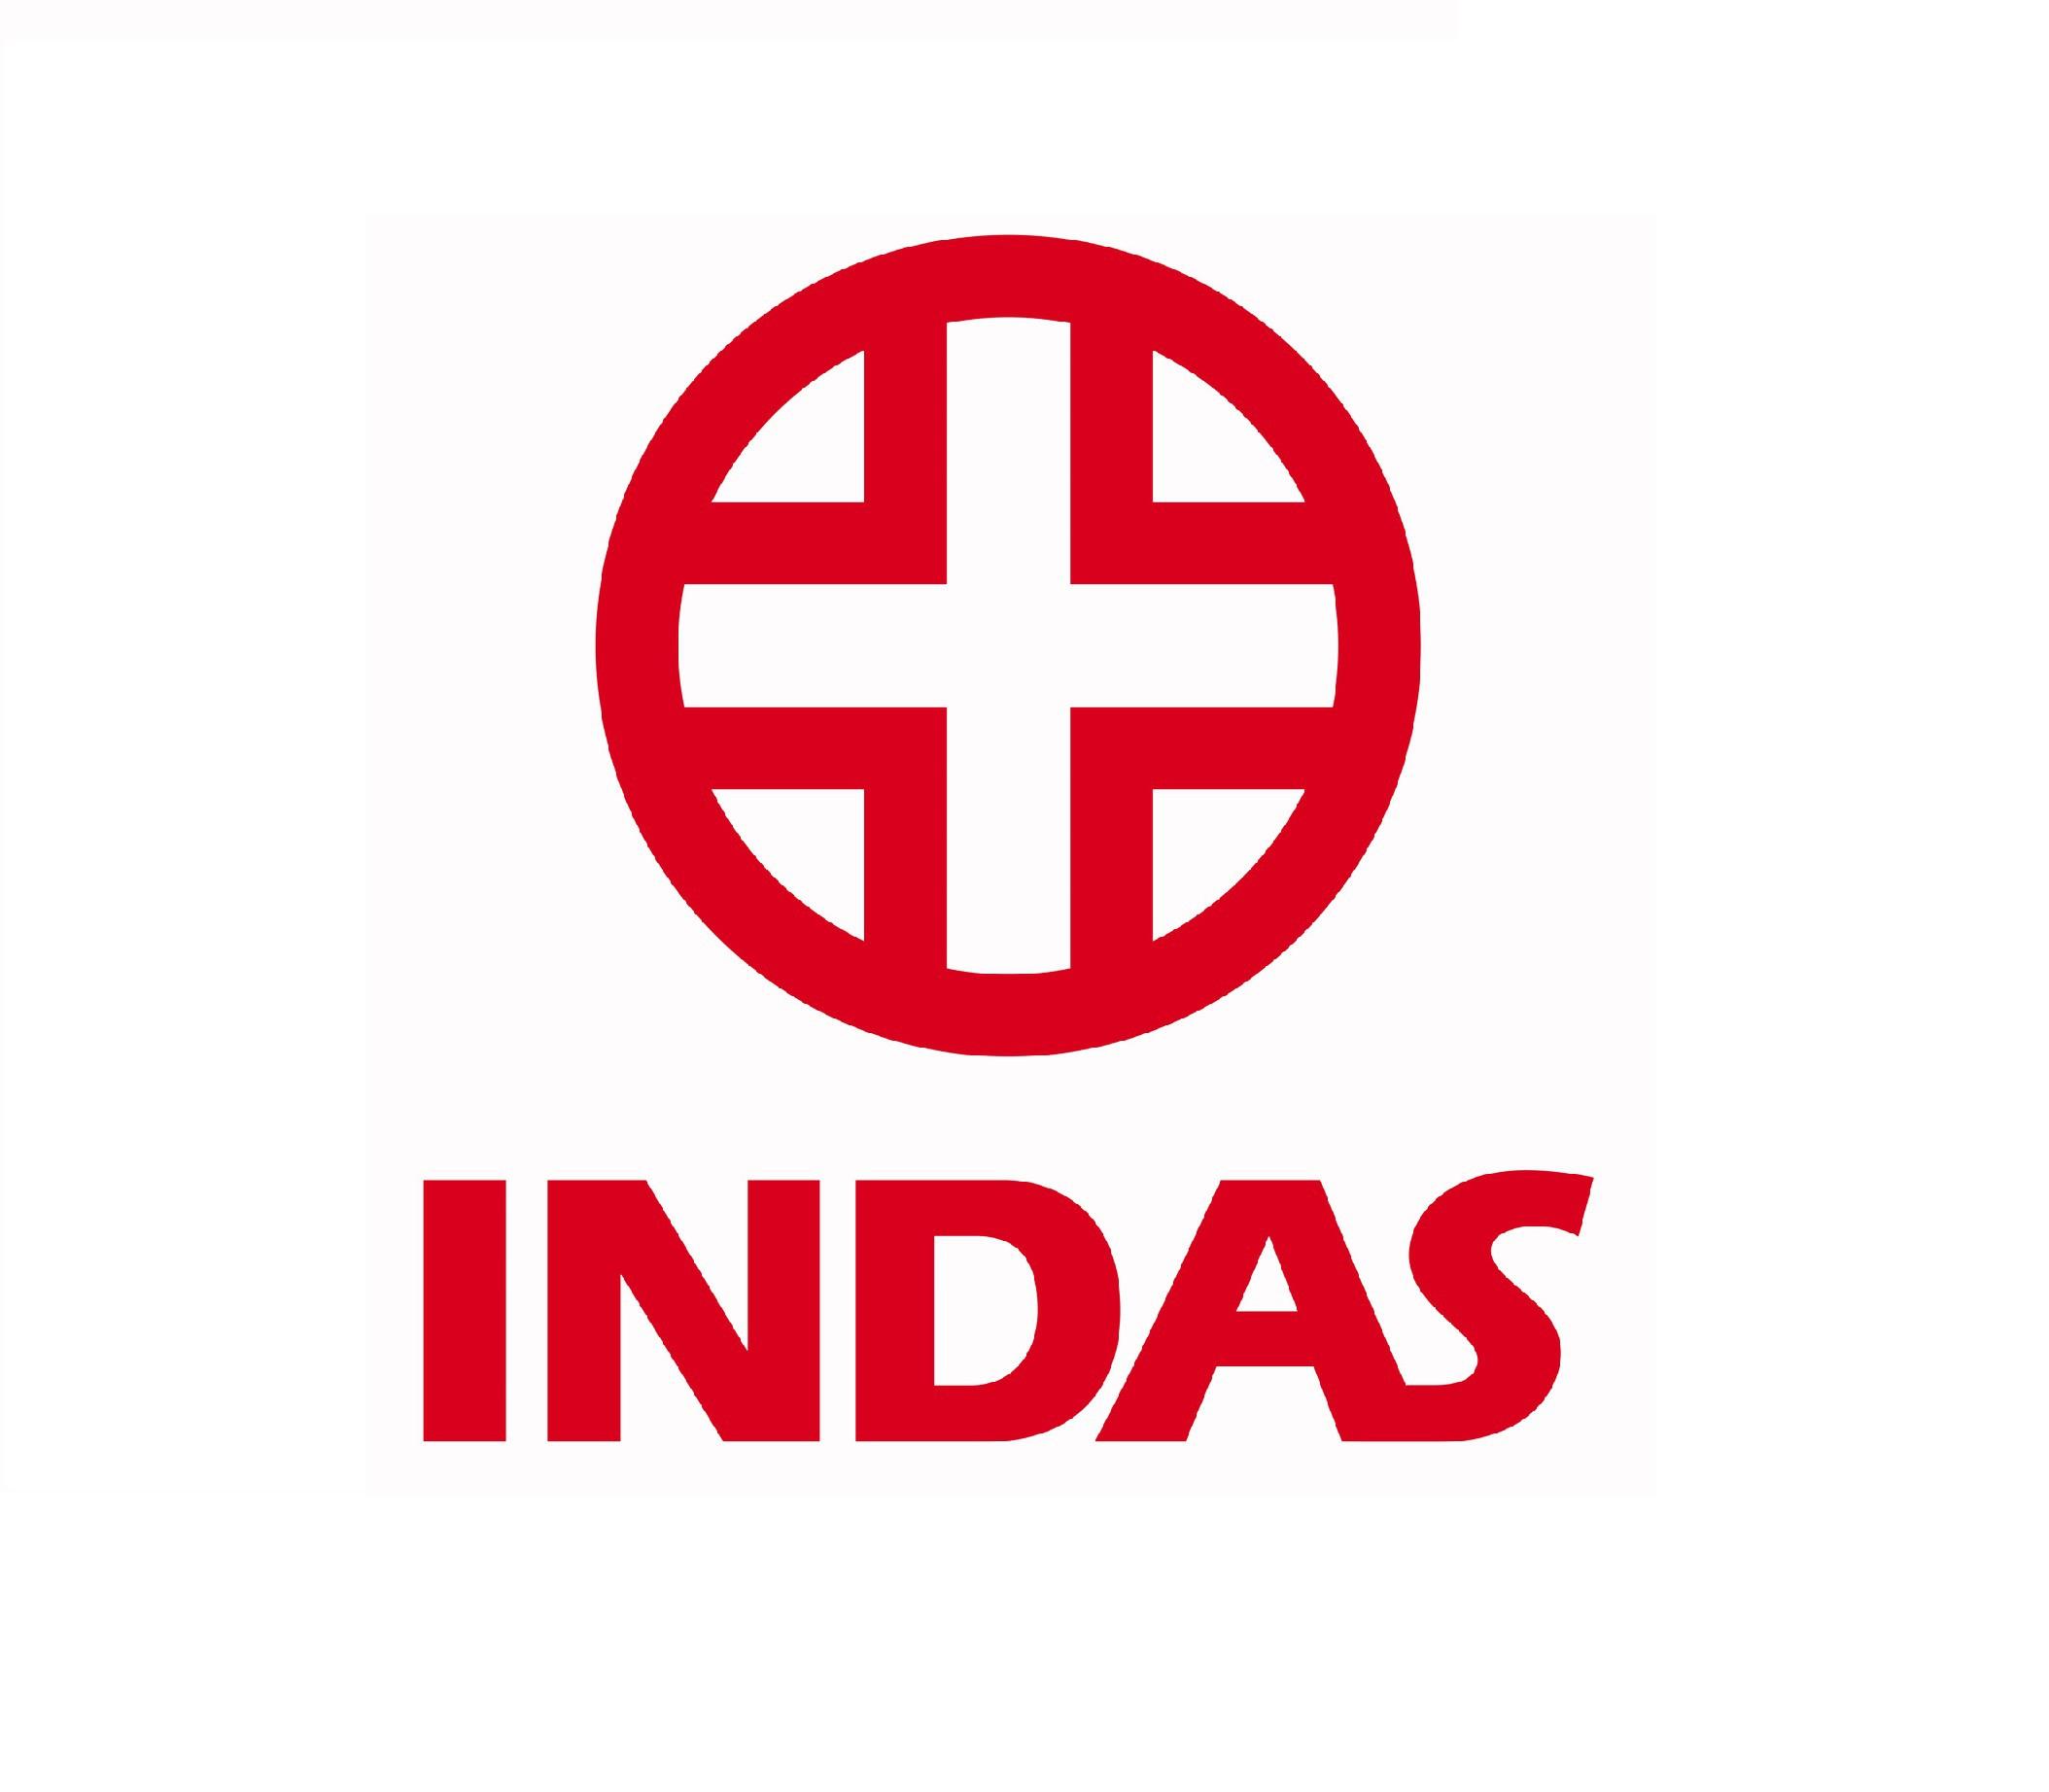 INDAS